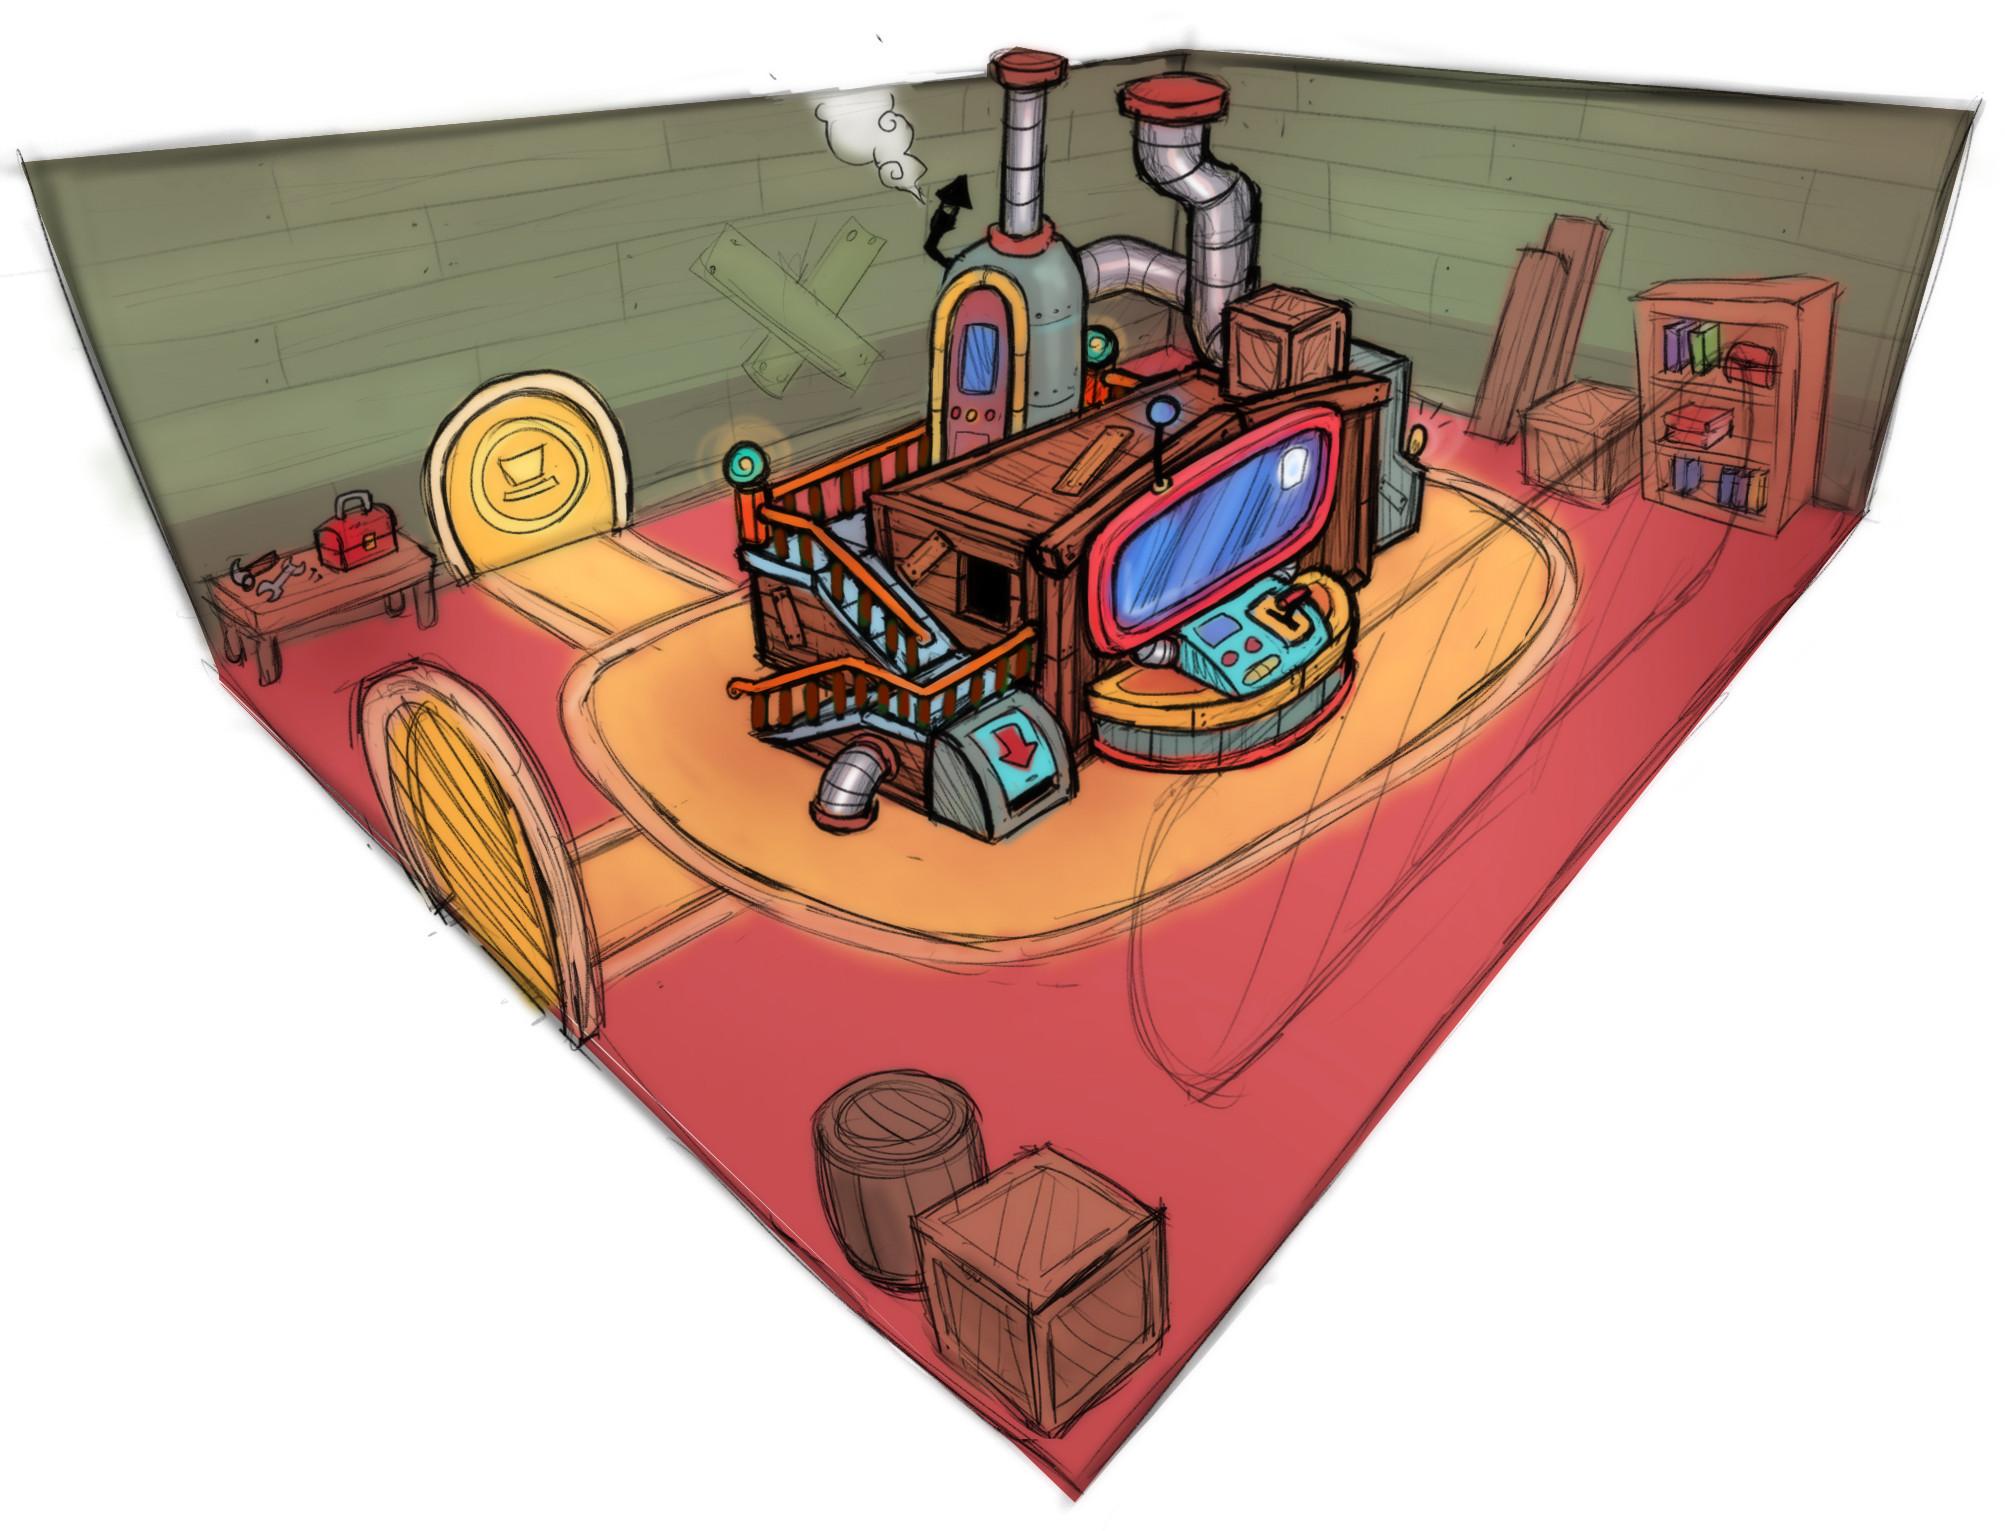 Hat Kid's Spaceship - Engine Room